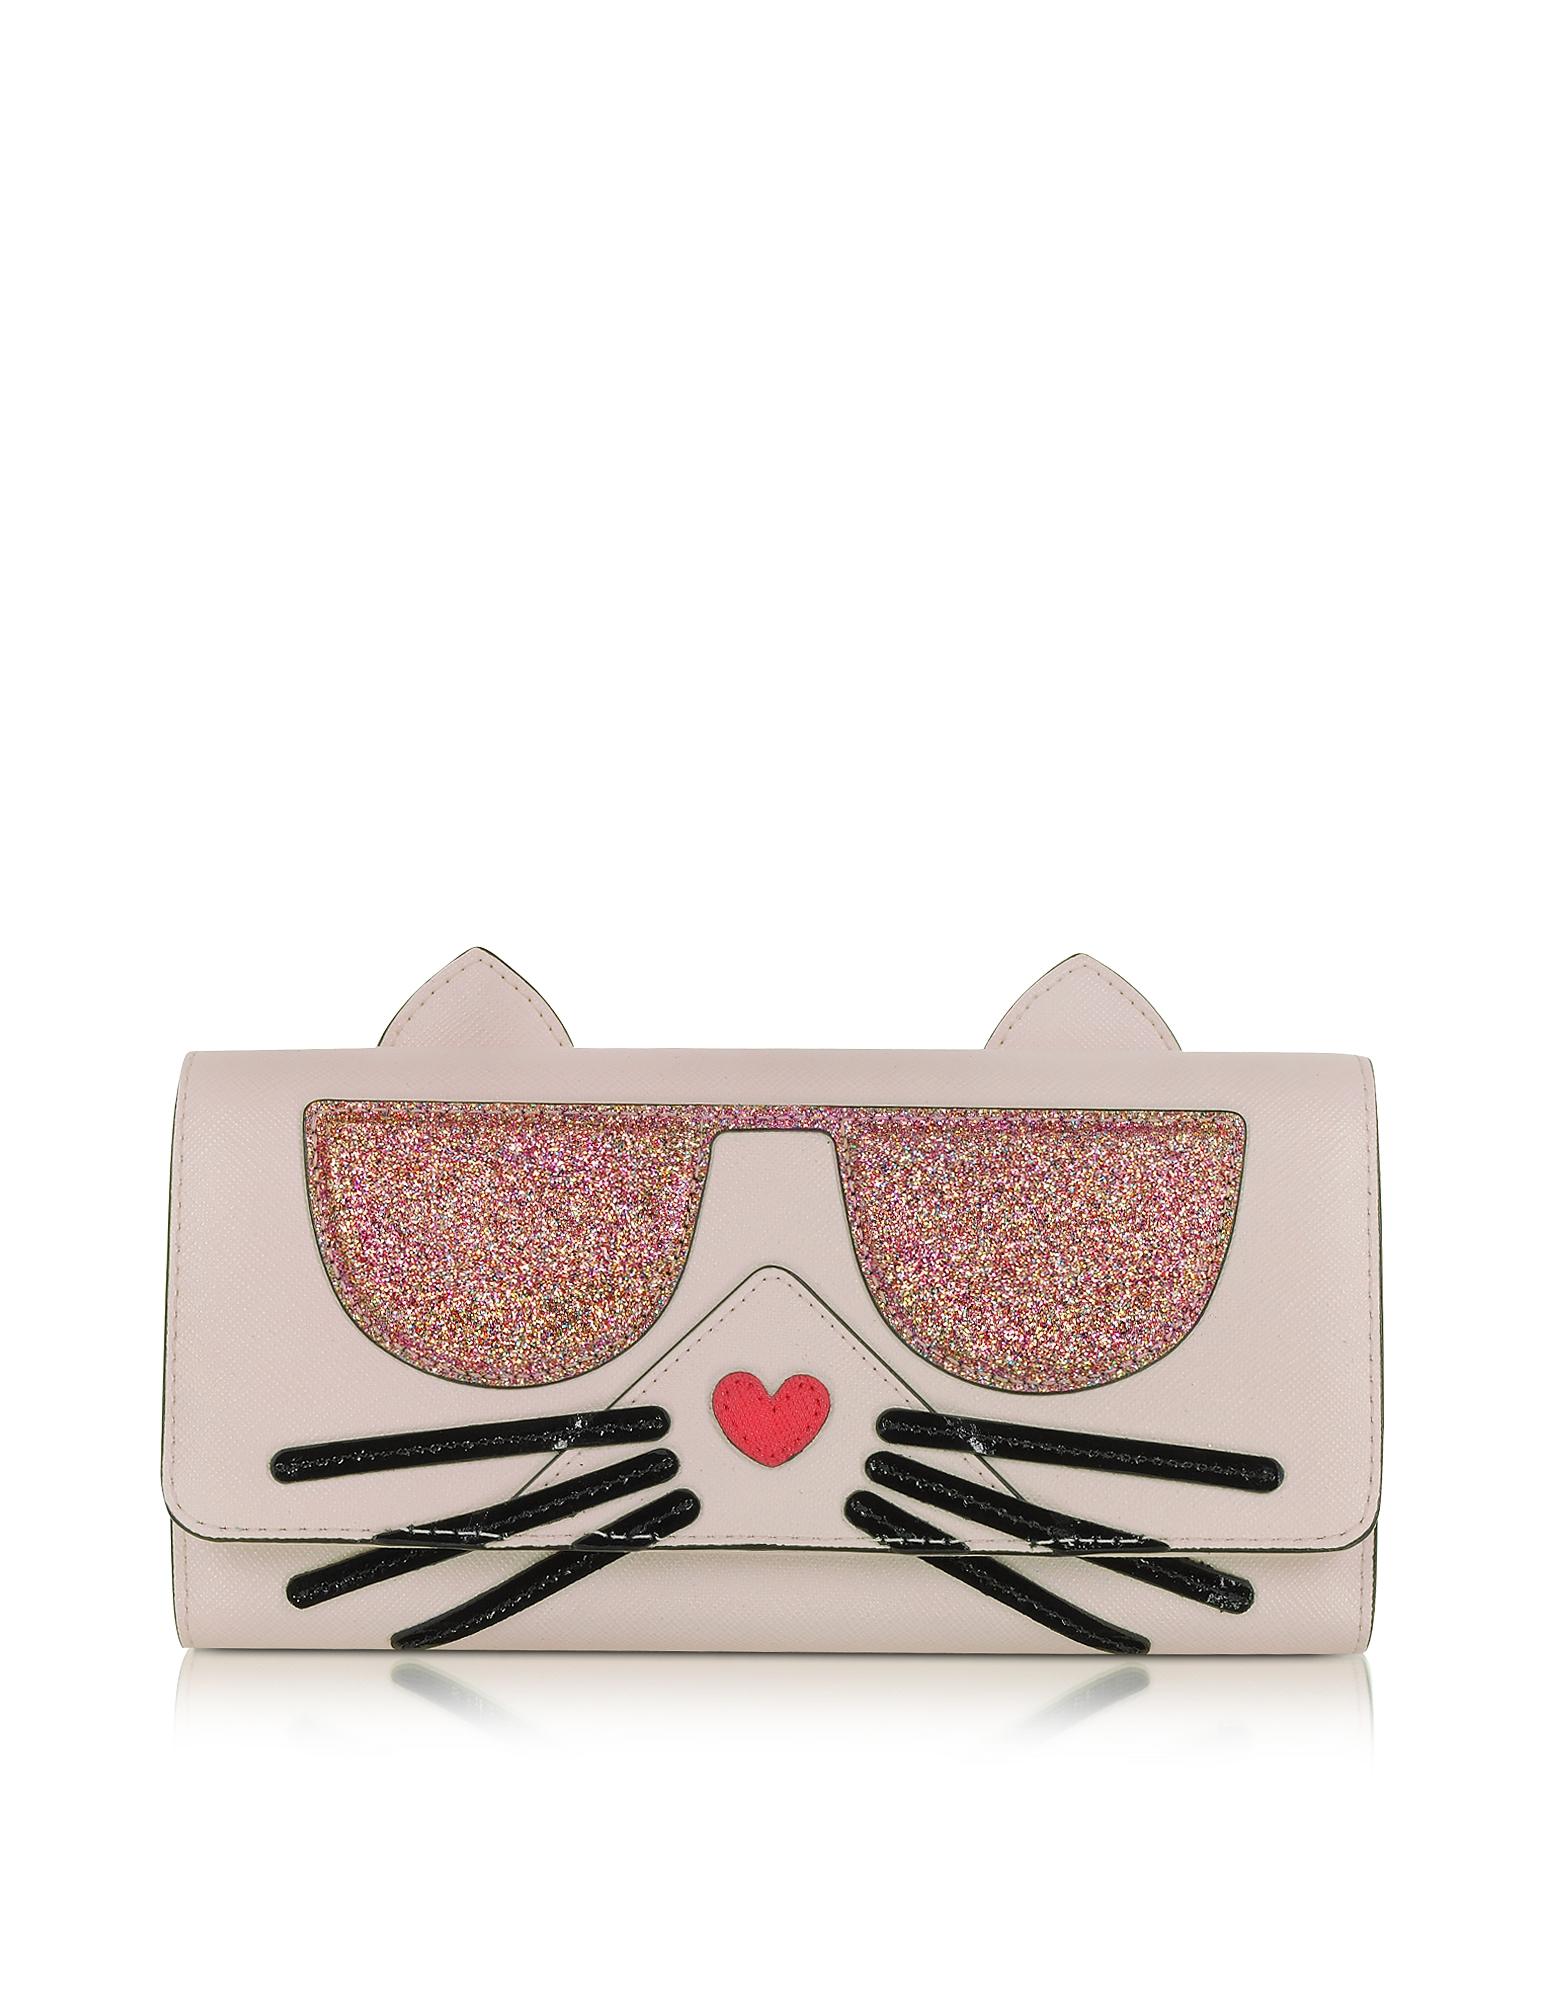 Karl Lagerfeld K/Kocktail Choupette - Кошелек с Блестками